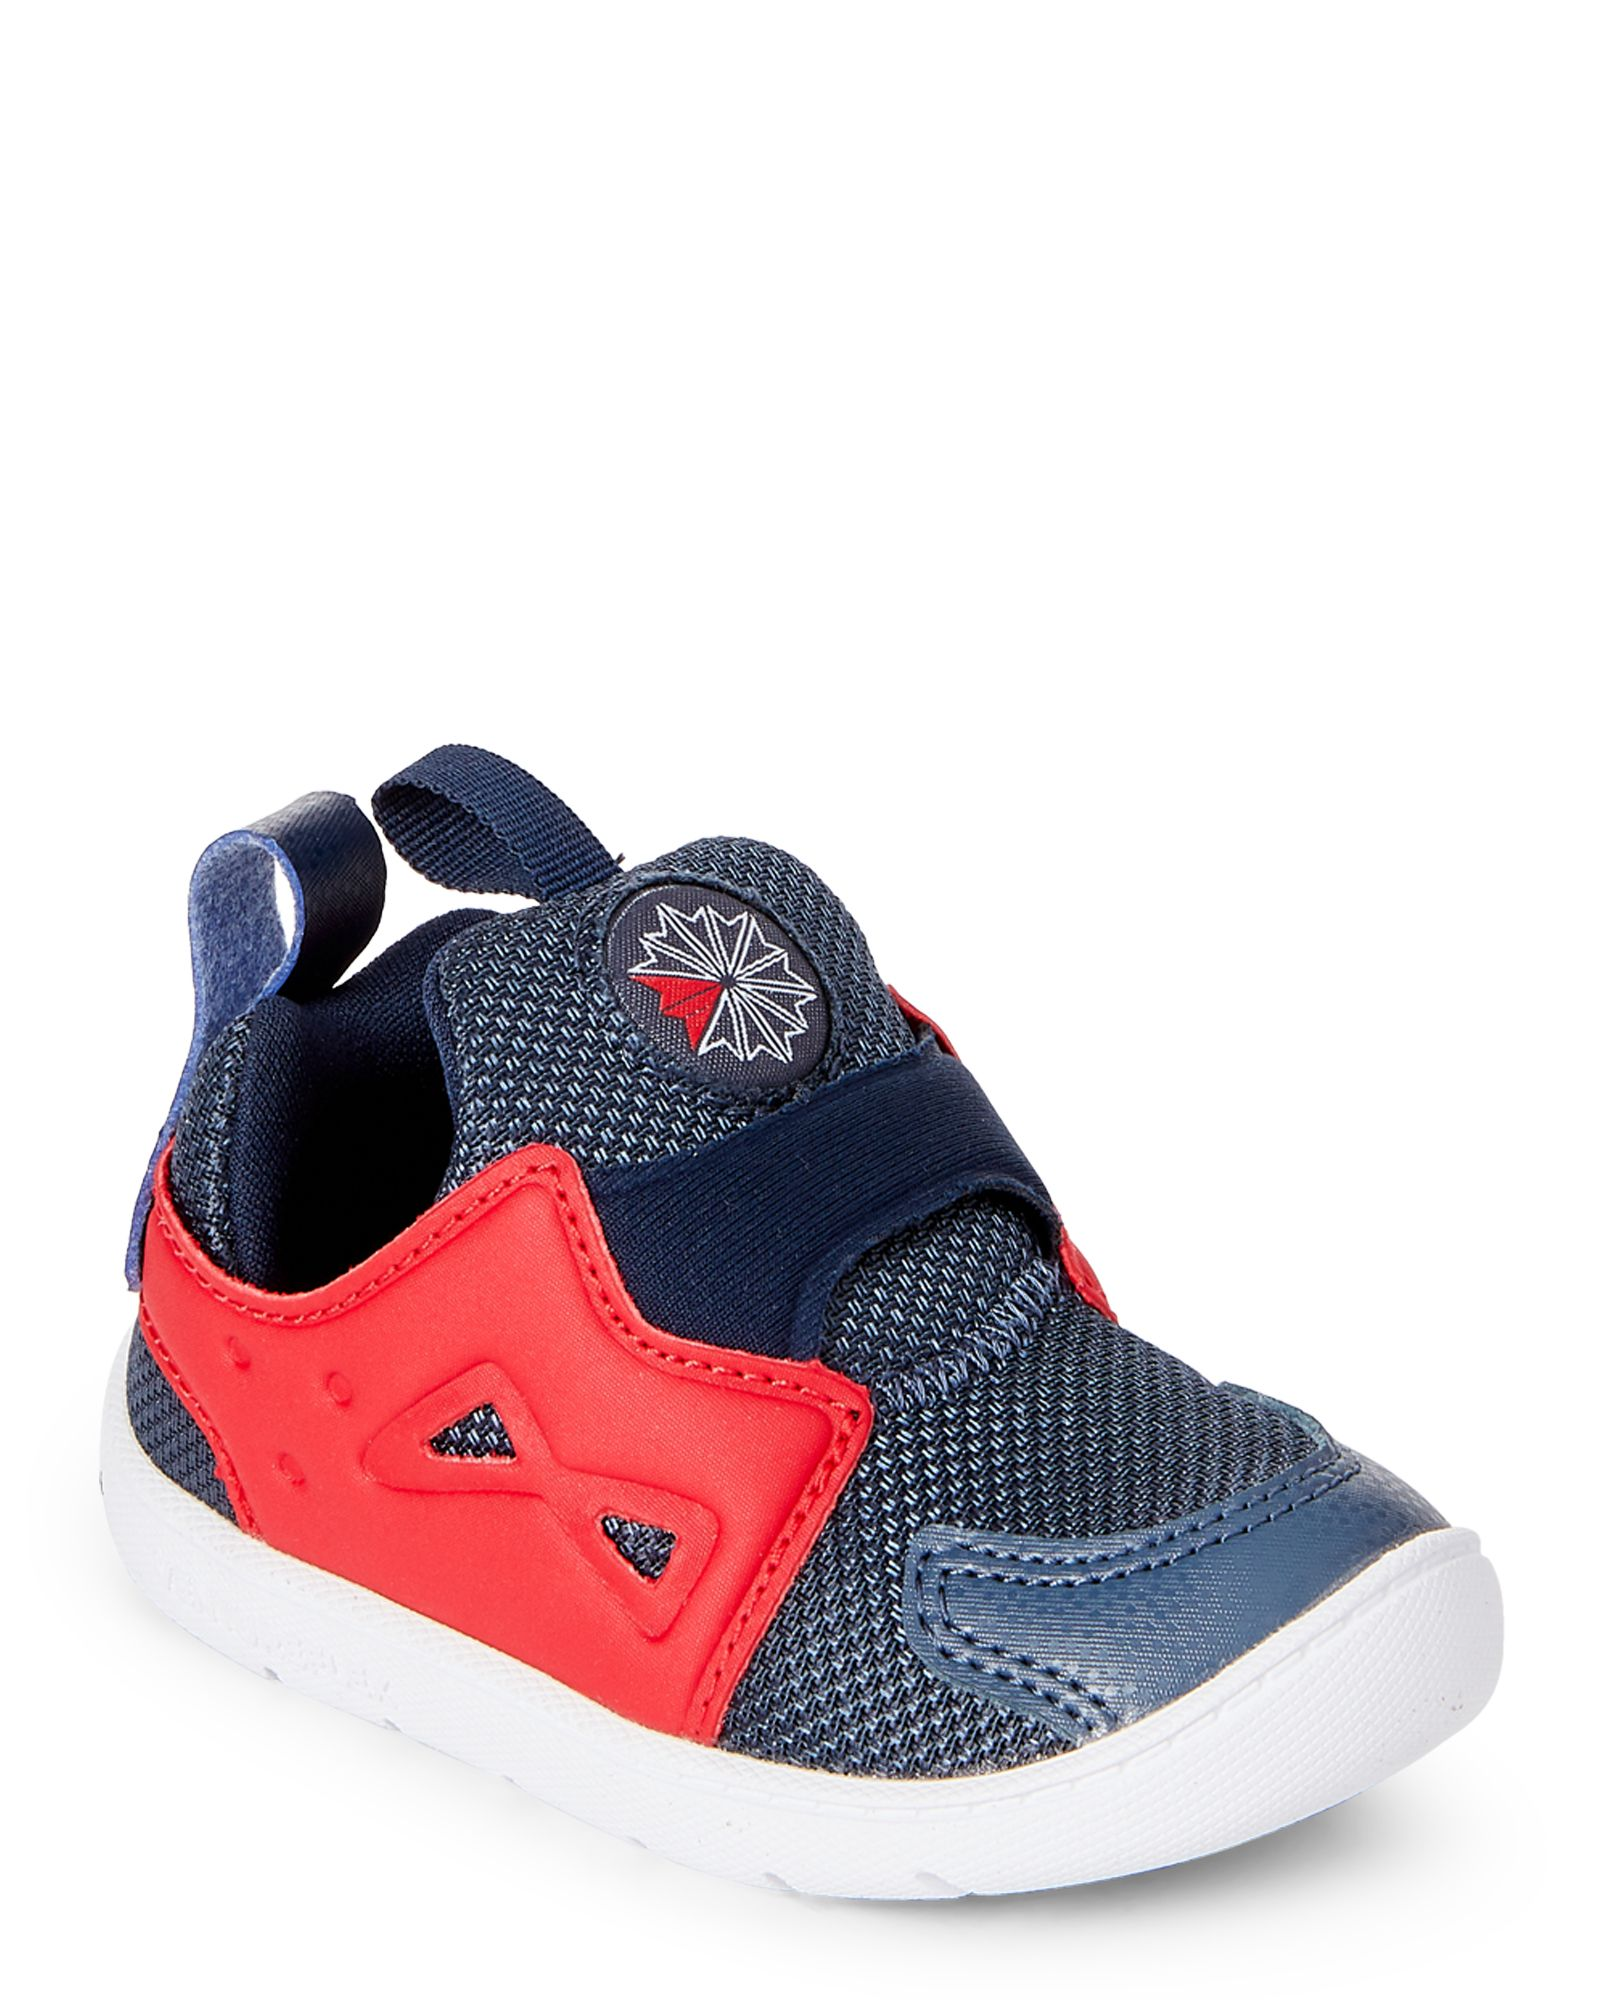 Reebok (Toddler Boys) Indigo   Red Venture Flex Slip-On Sneakers 96181746d